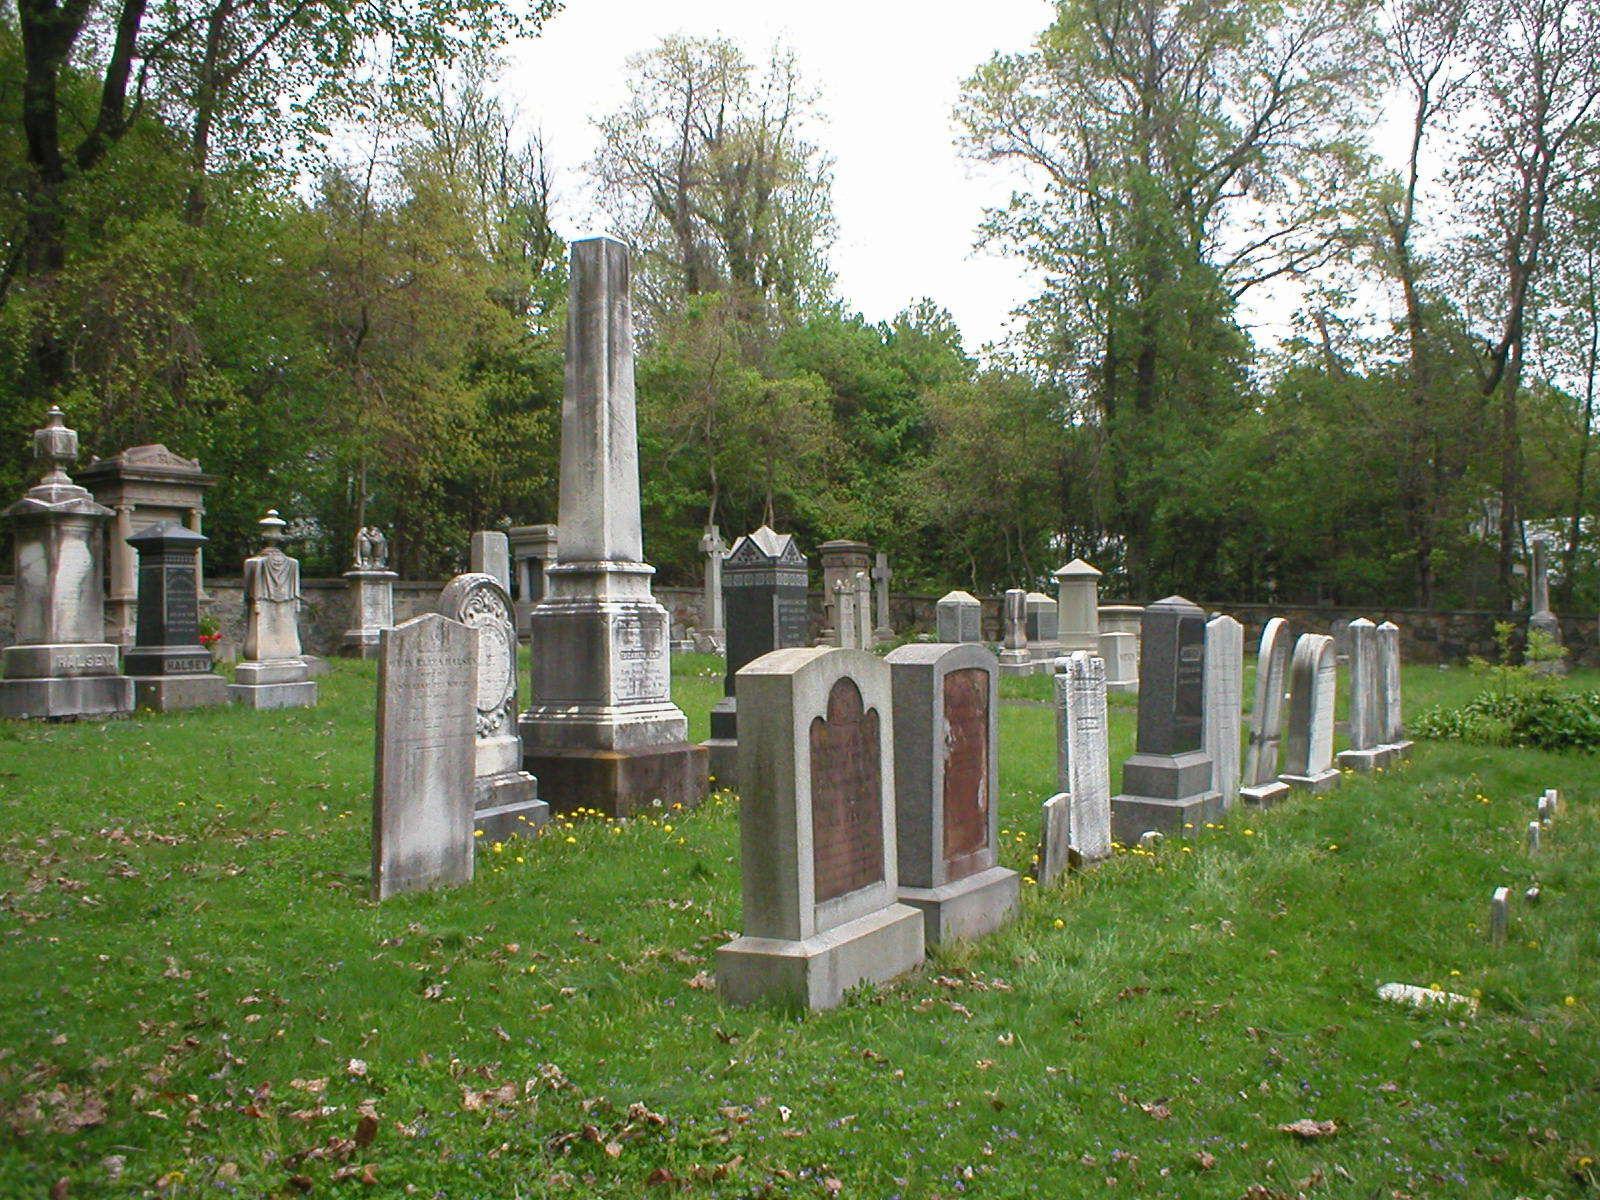 Ely Cemetery in Livingston NJ